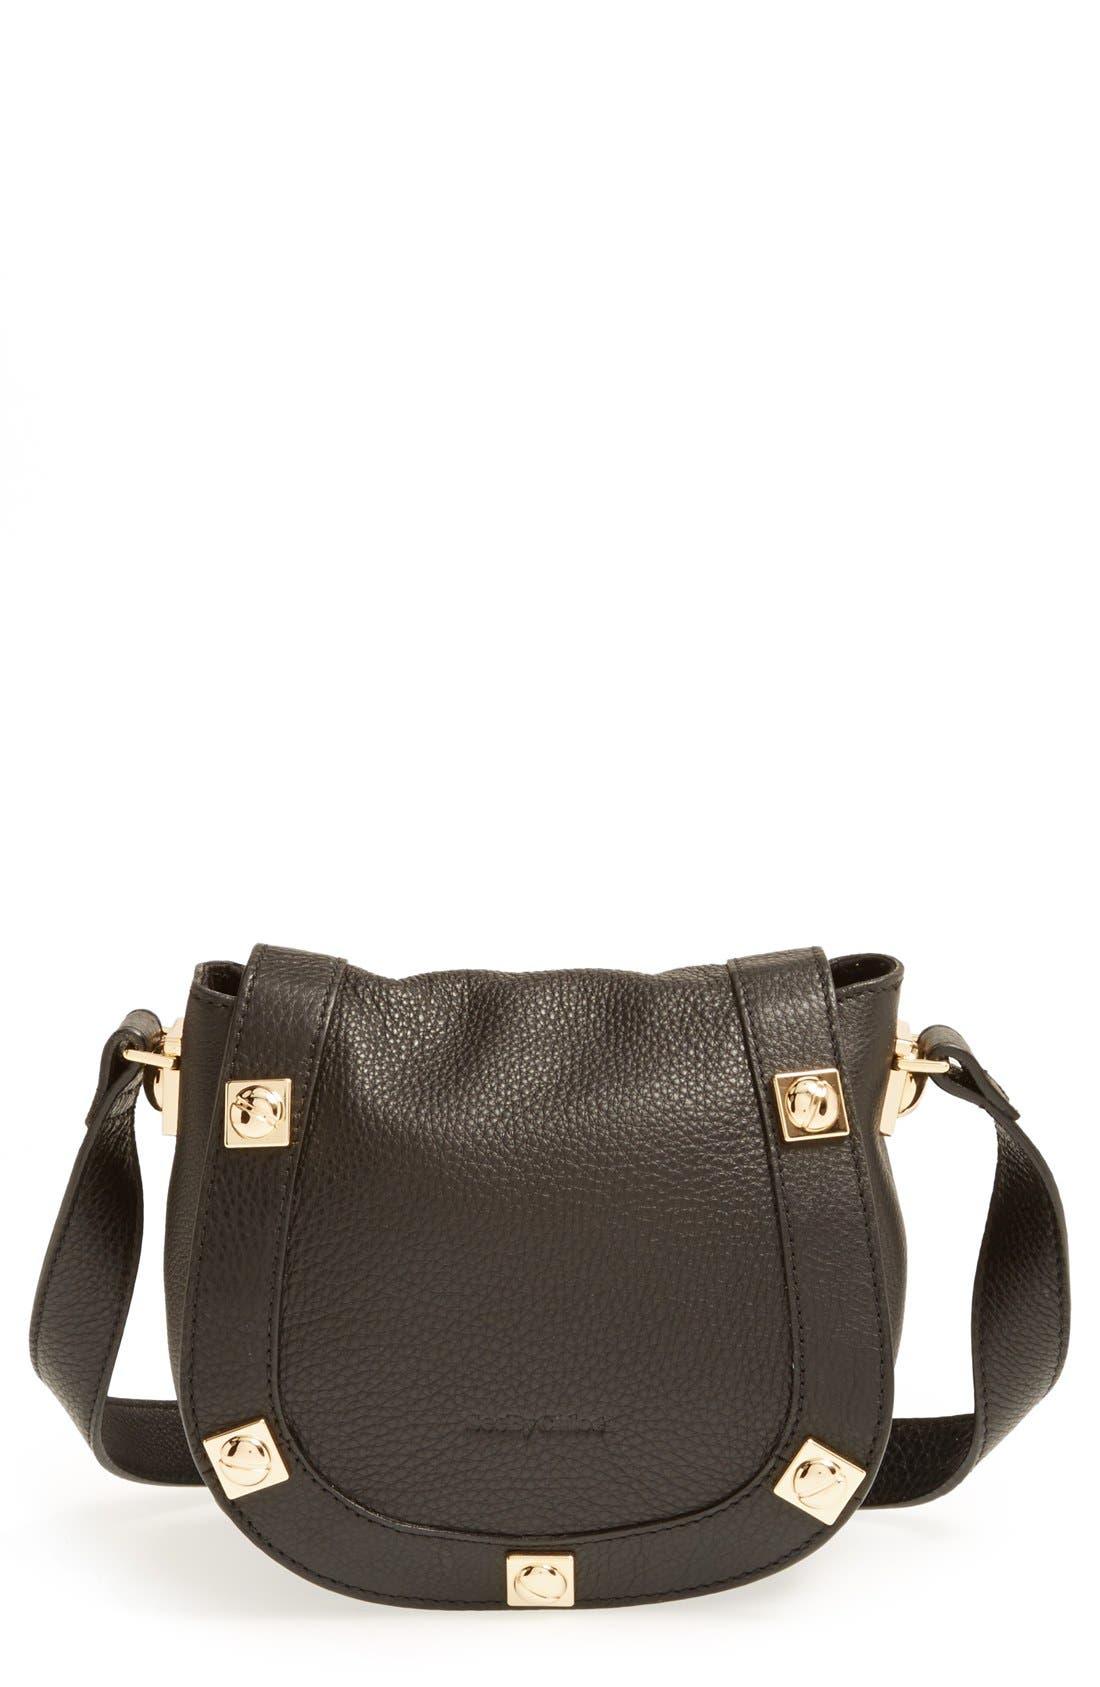 'Mini Sadie' Leather Crossbody Bag, Main, color, 001